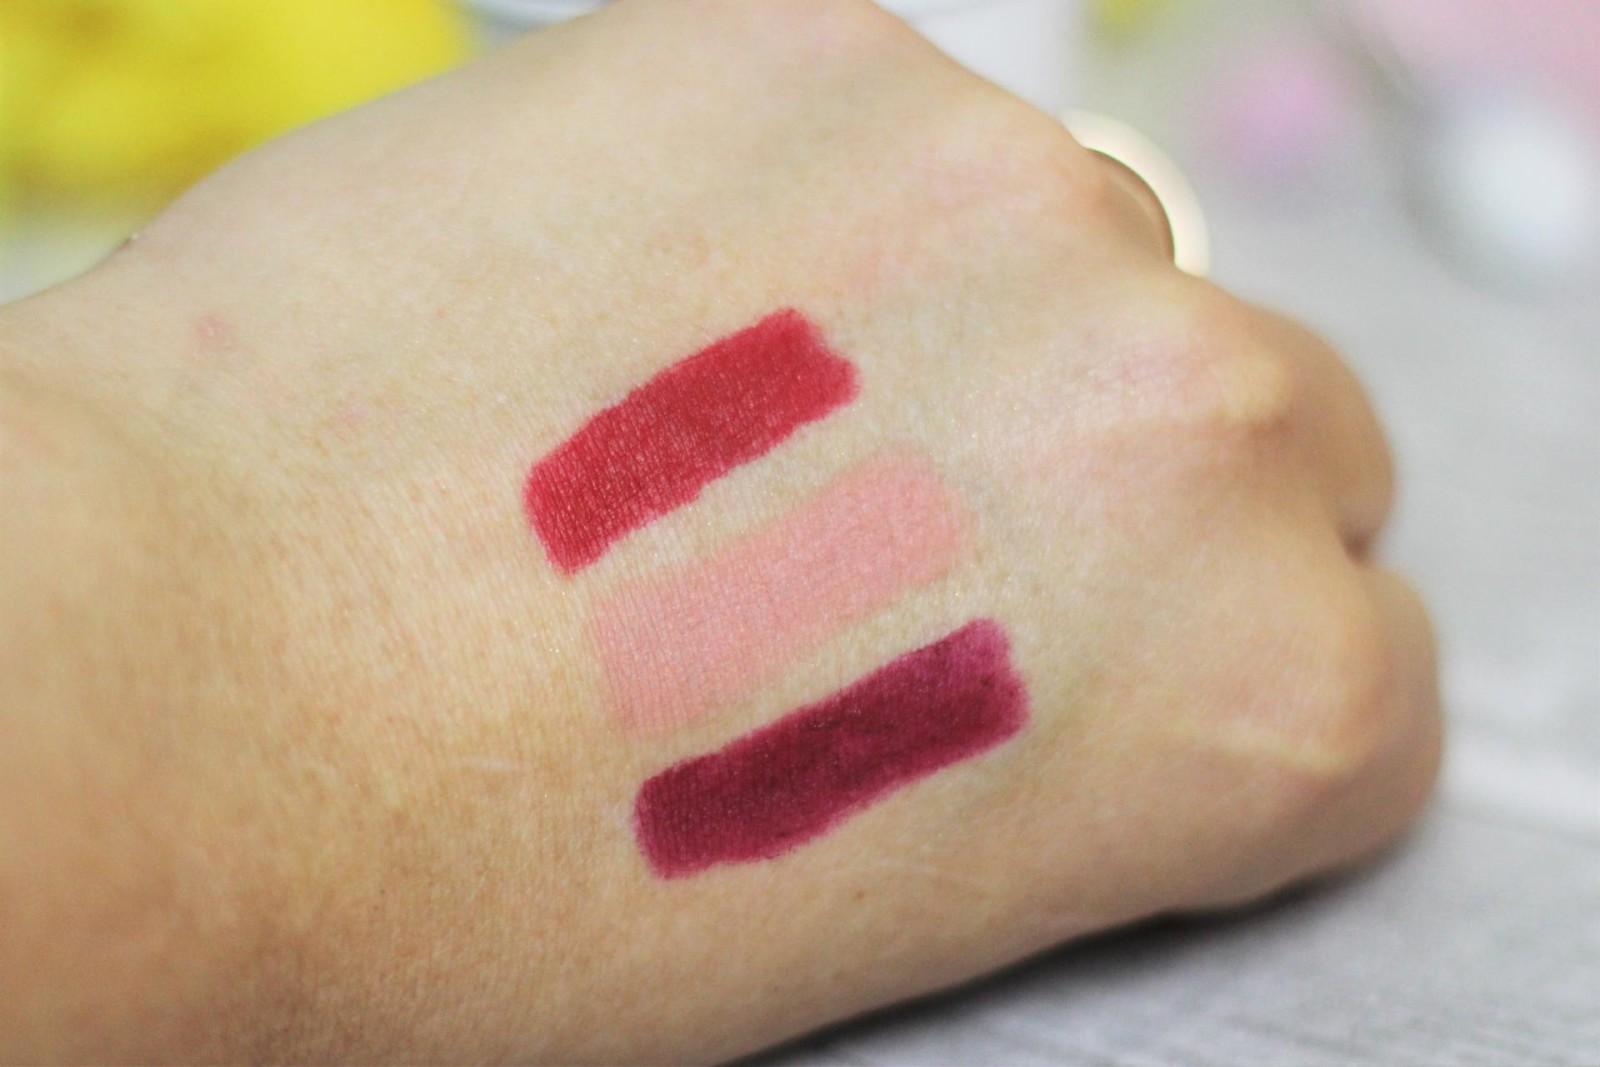 LOC by Birchbox Vibrant Matte Lipsticks